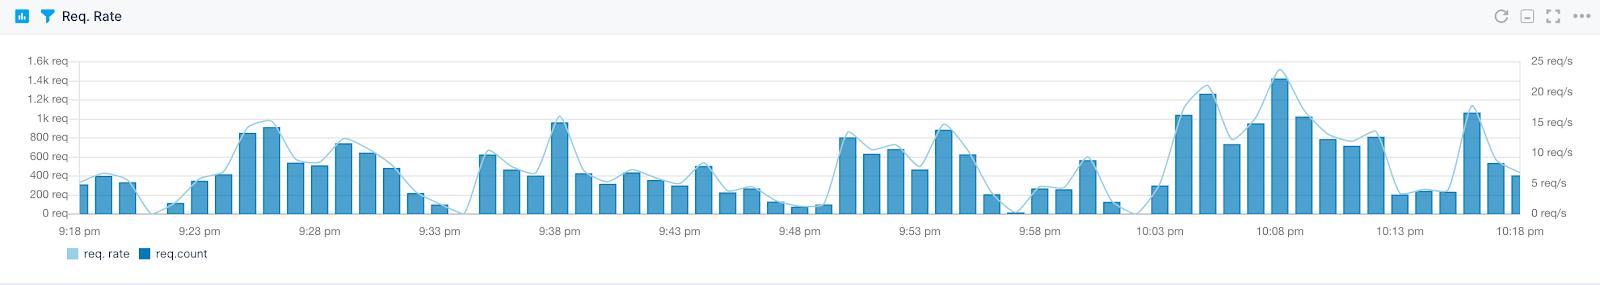 Solr Monitoring Performance Metrics